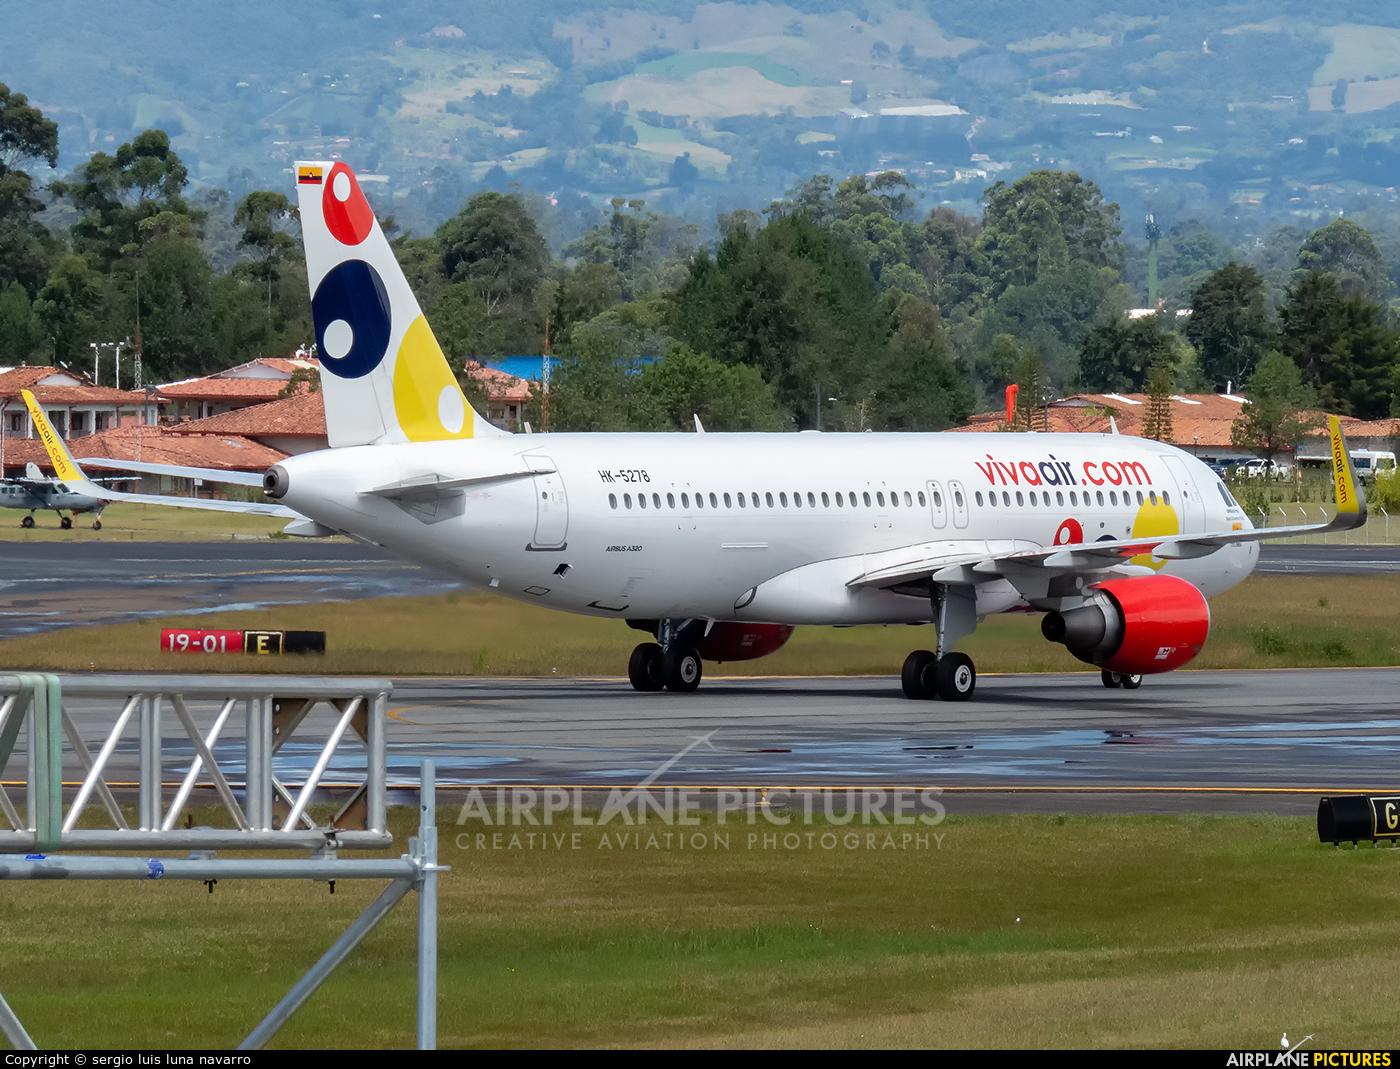 Viva Air HK-5278 aircraft at Medellin - Jose Maria Cordova Intl